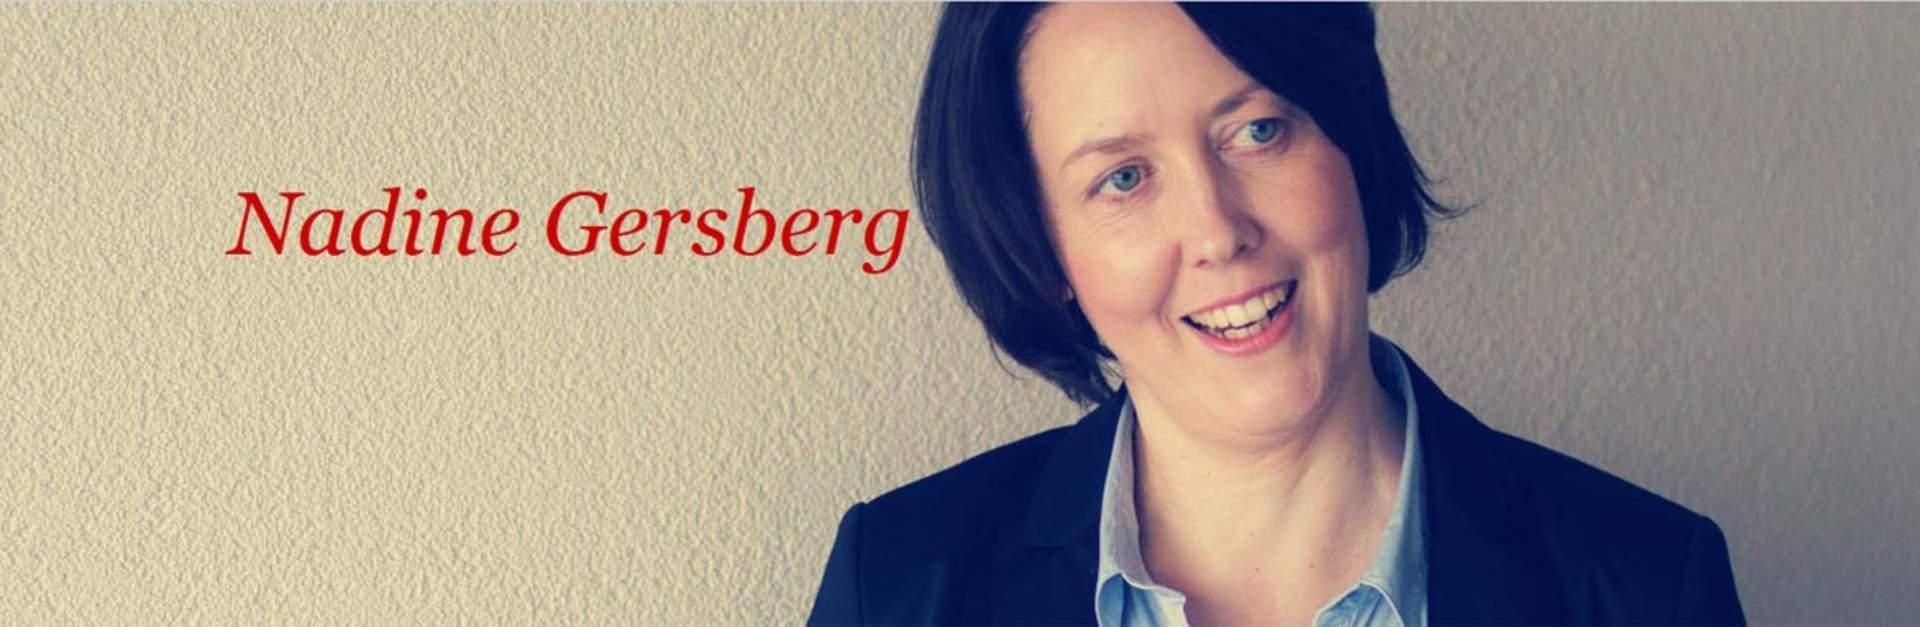 Direktkandidatin der SPD-Offenbach - Landtagswahl am 28. Oktober 2018